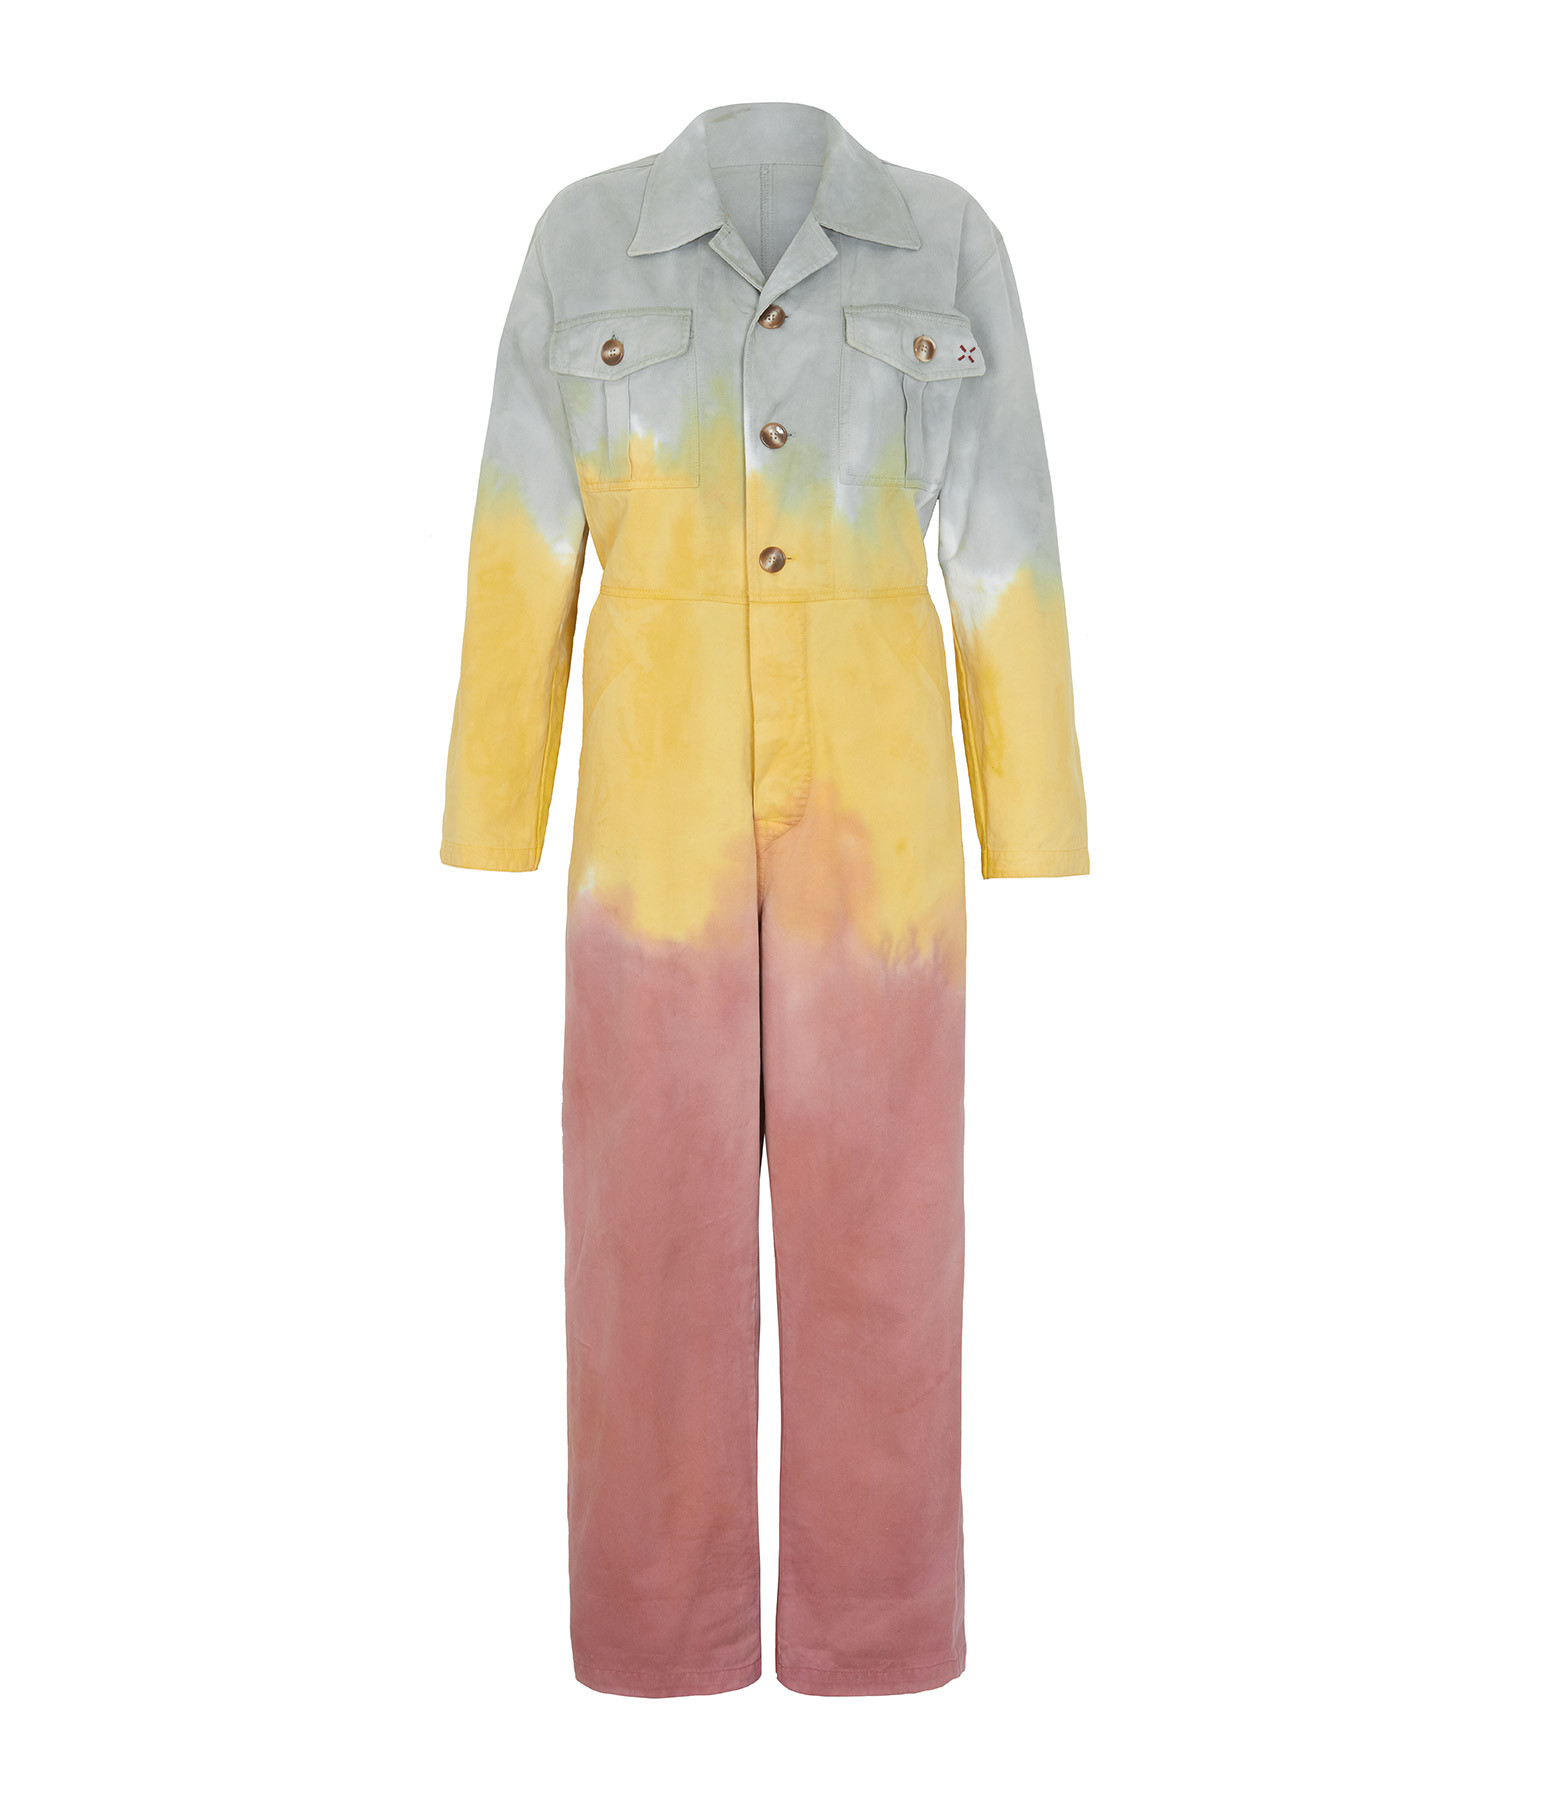 LOVE & LET DYE - Combinaison Brooklyn Coton Multicolore